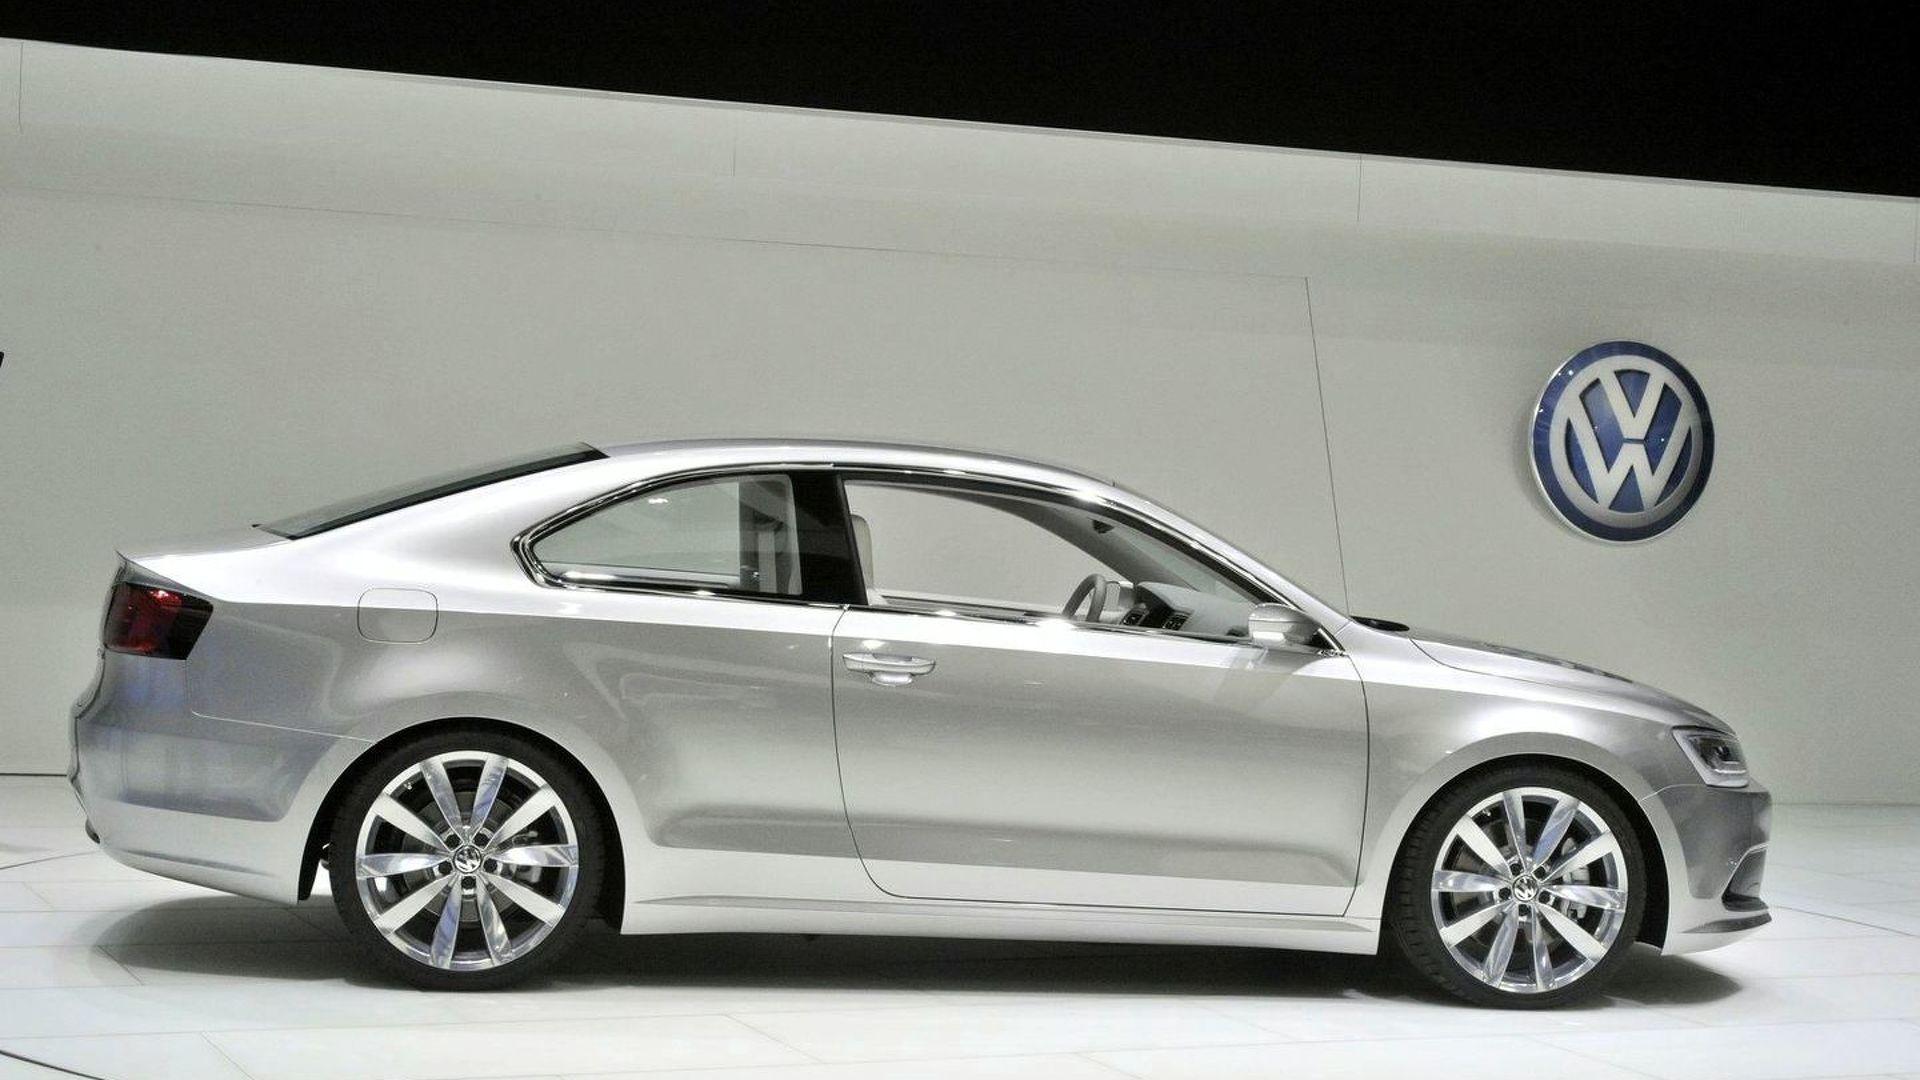 2019 Vw Jetta Gli >> 2011 VW Jetta R Sport Version Being Considered for U.S. - report